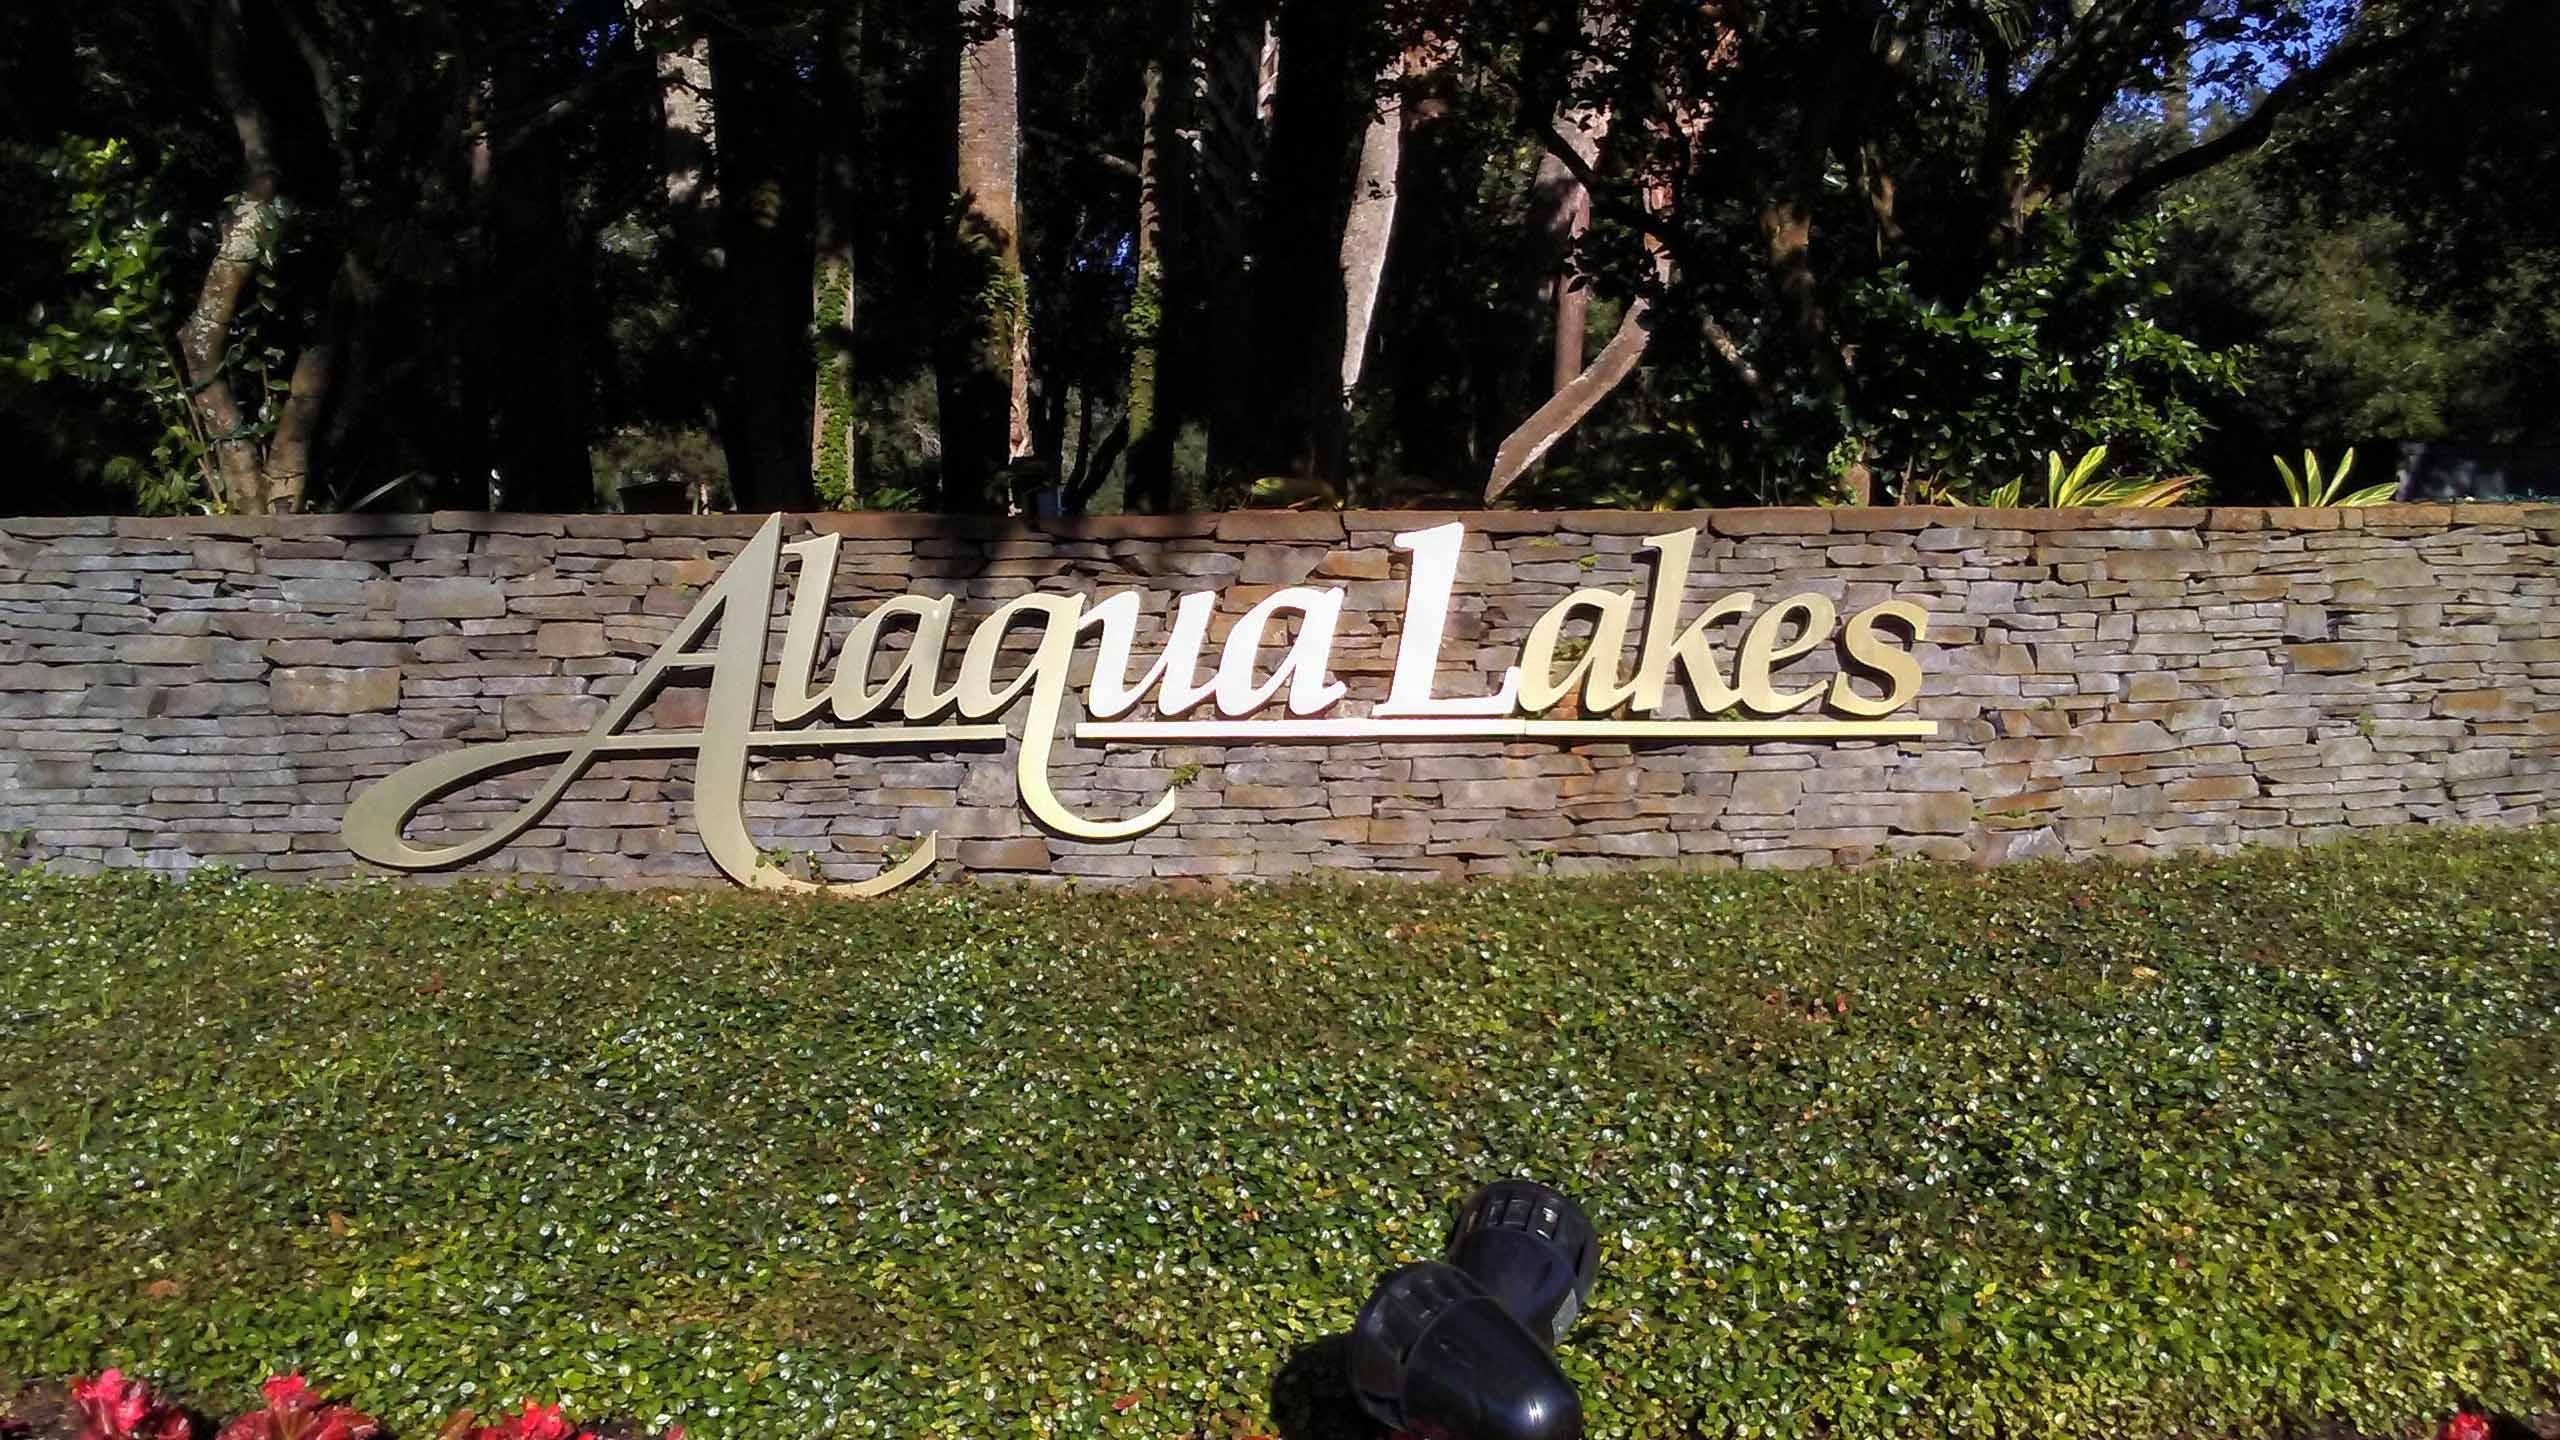 Alaqua Lakes, Longwood, Florida 32779